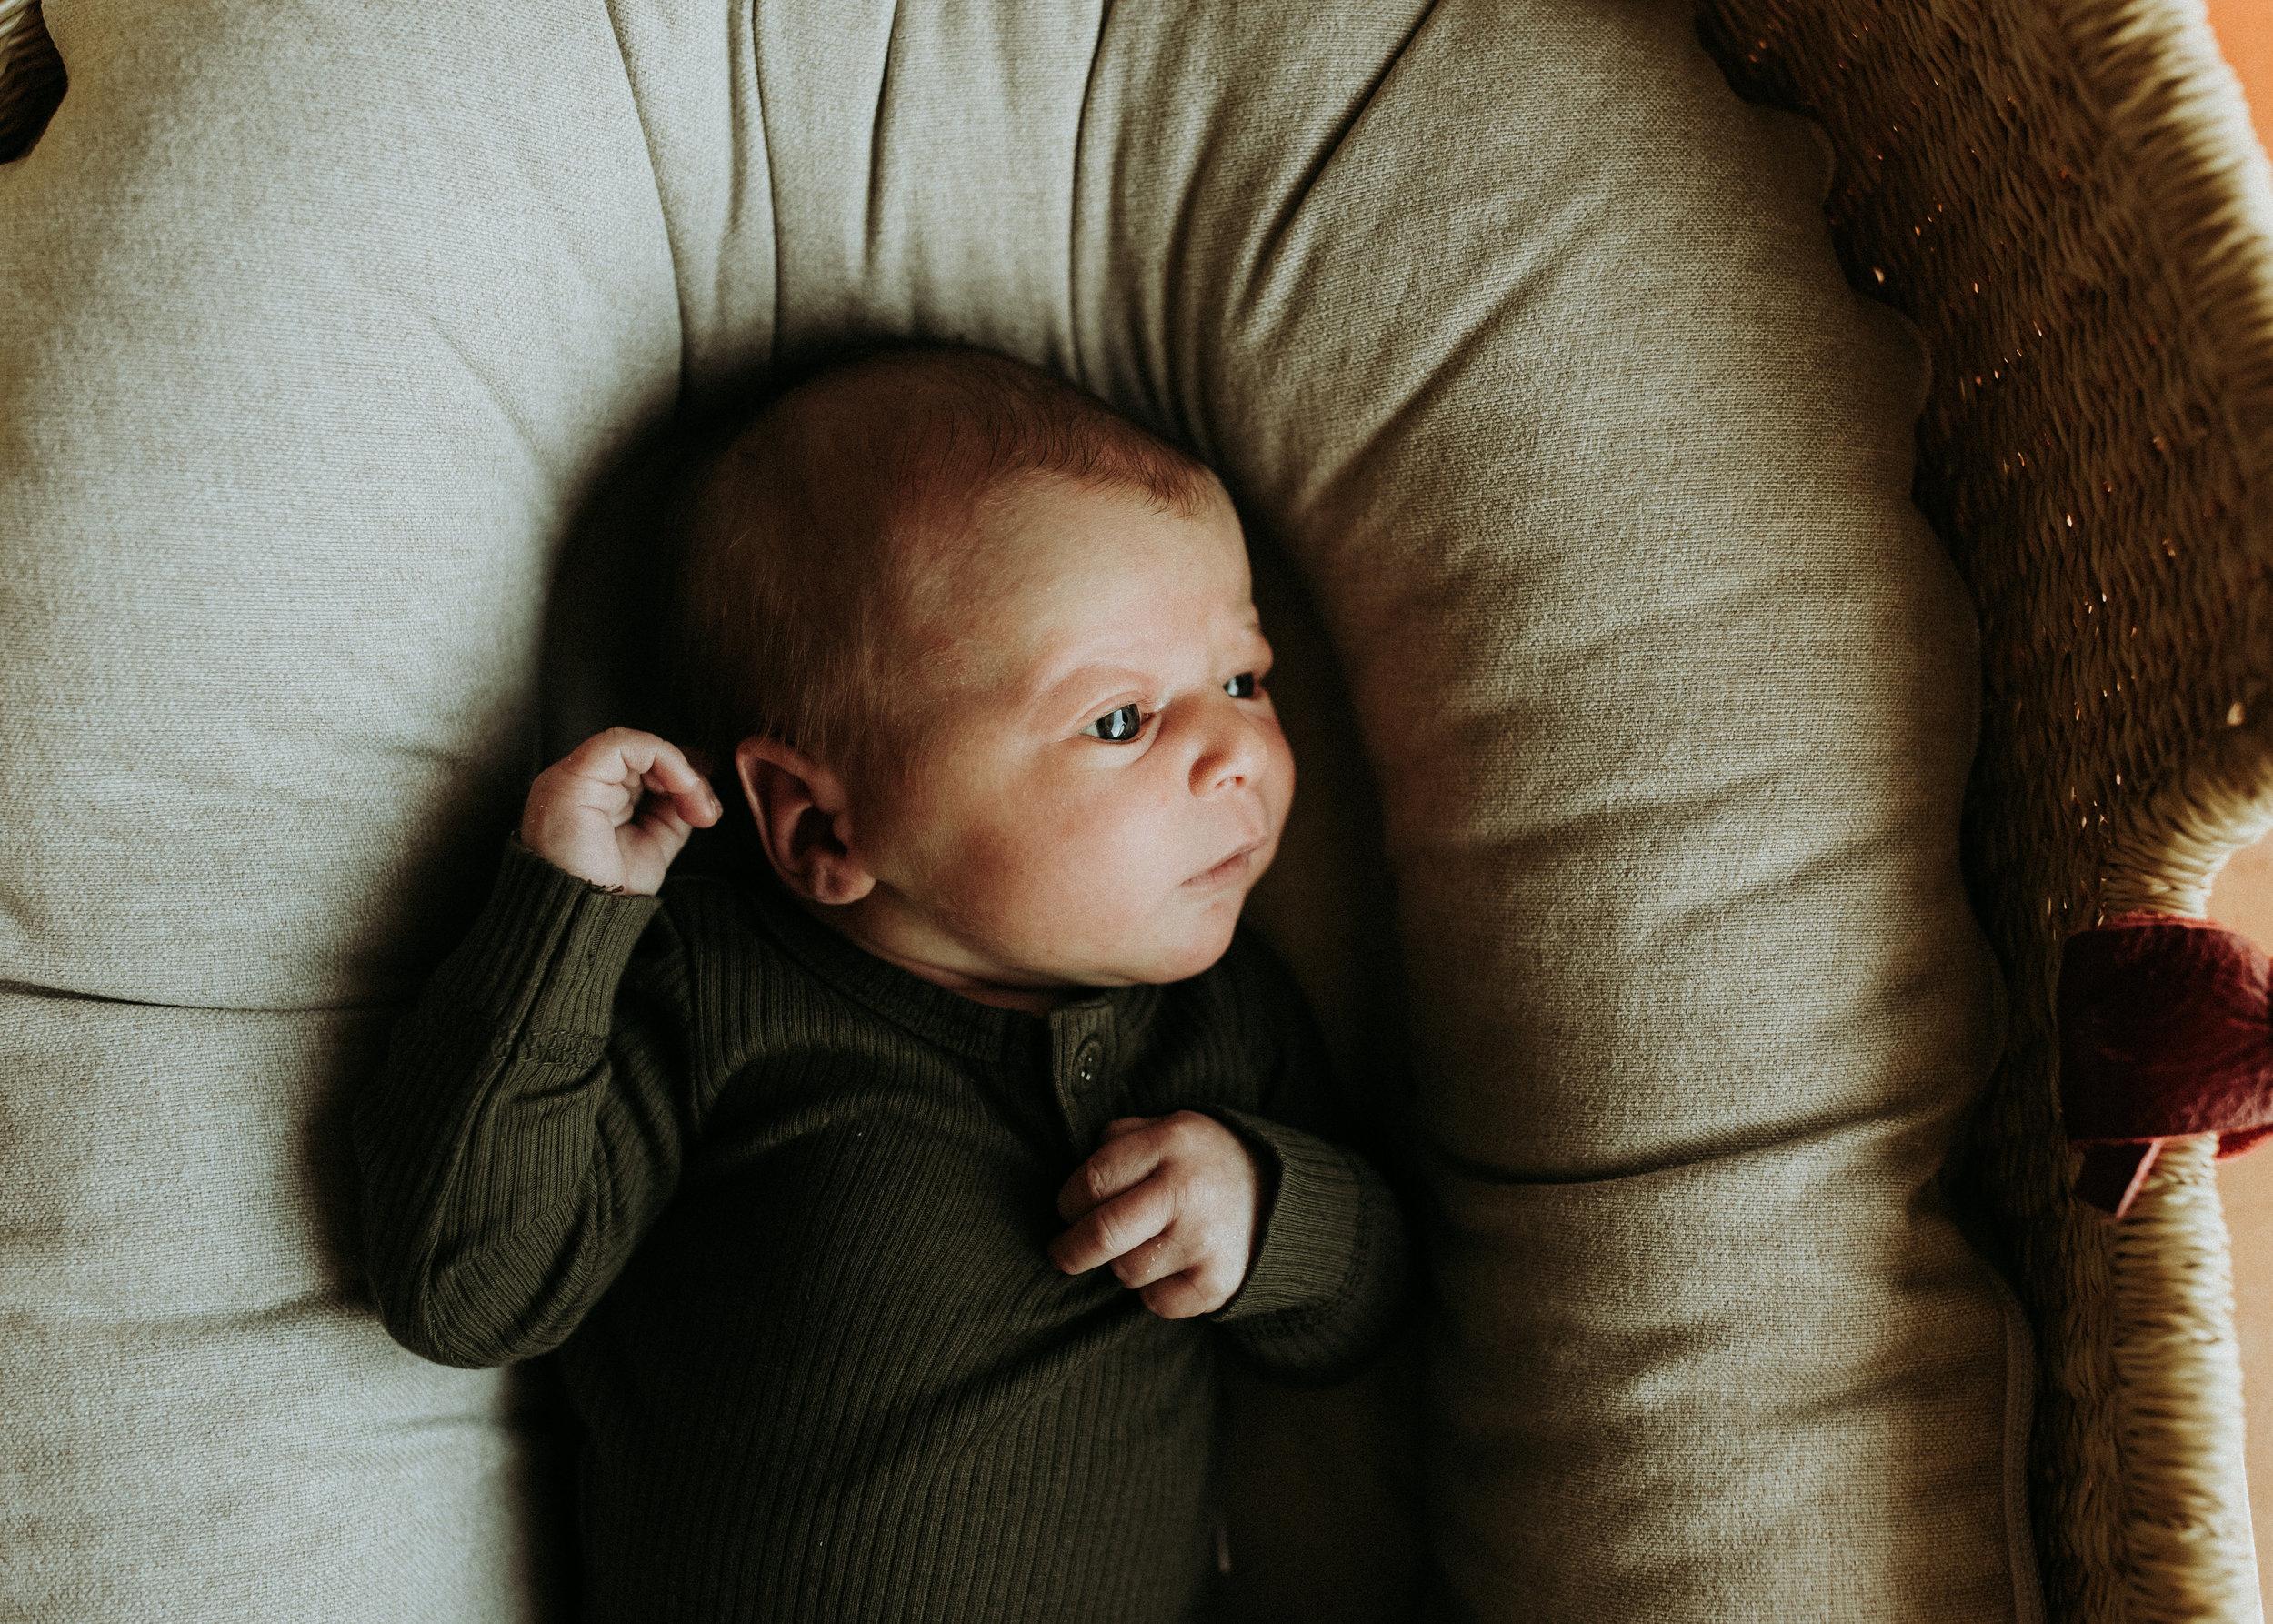 Newborn-Photographer-Bellingham-WA-Brianne-Bell-Photography-(Bennett)-54.jpg